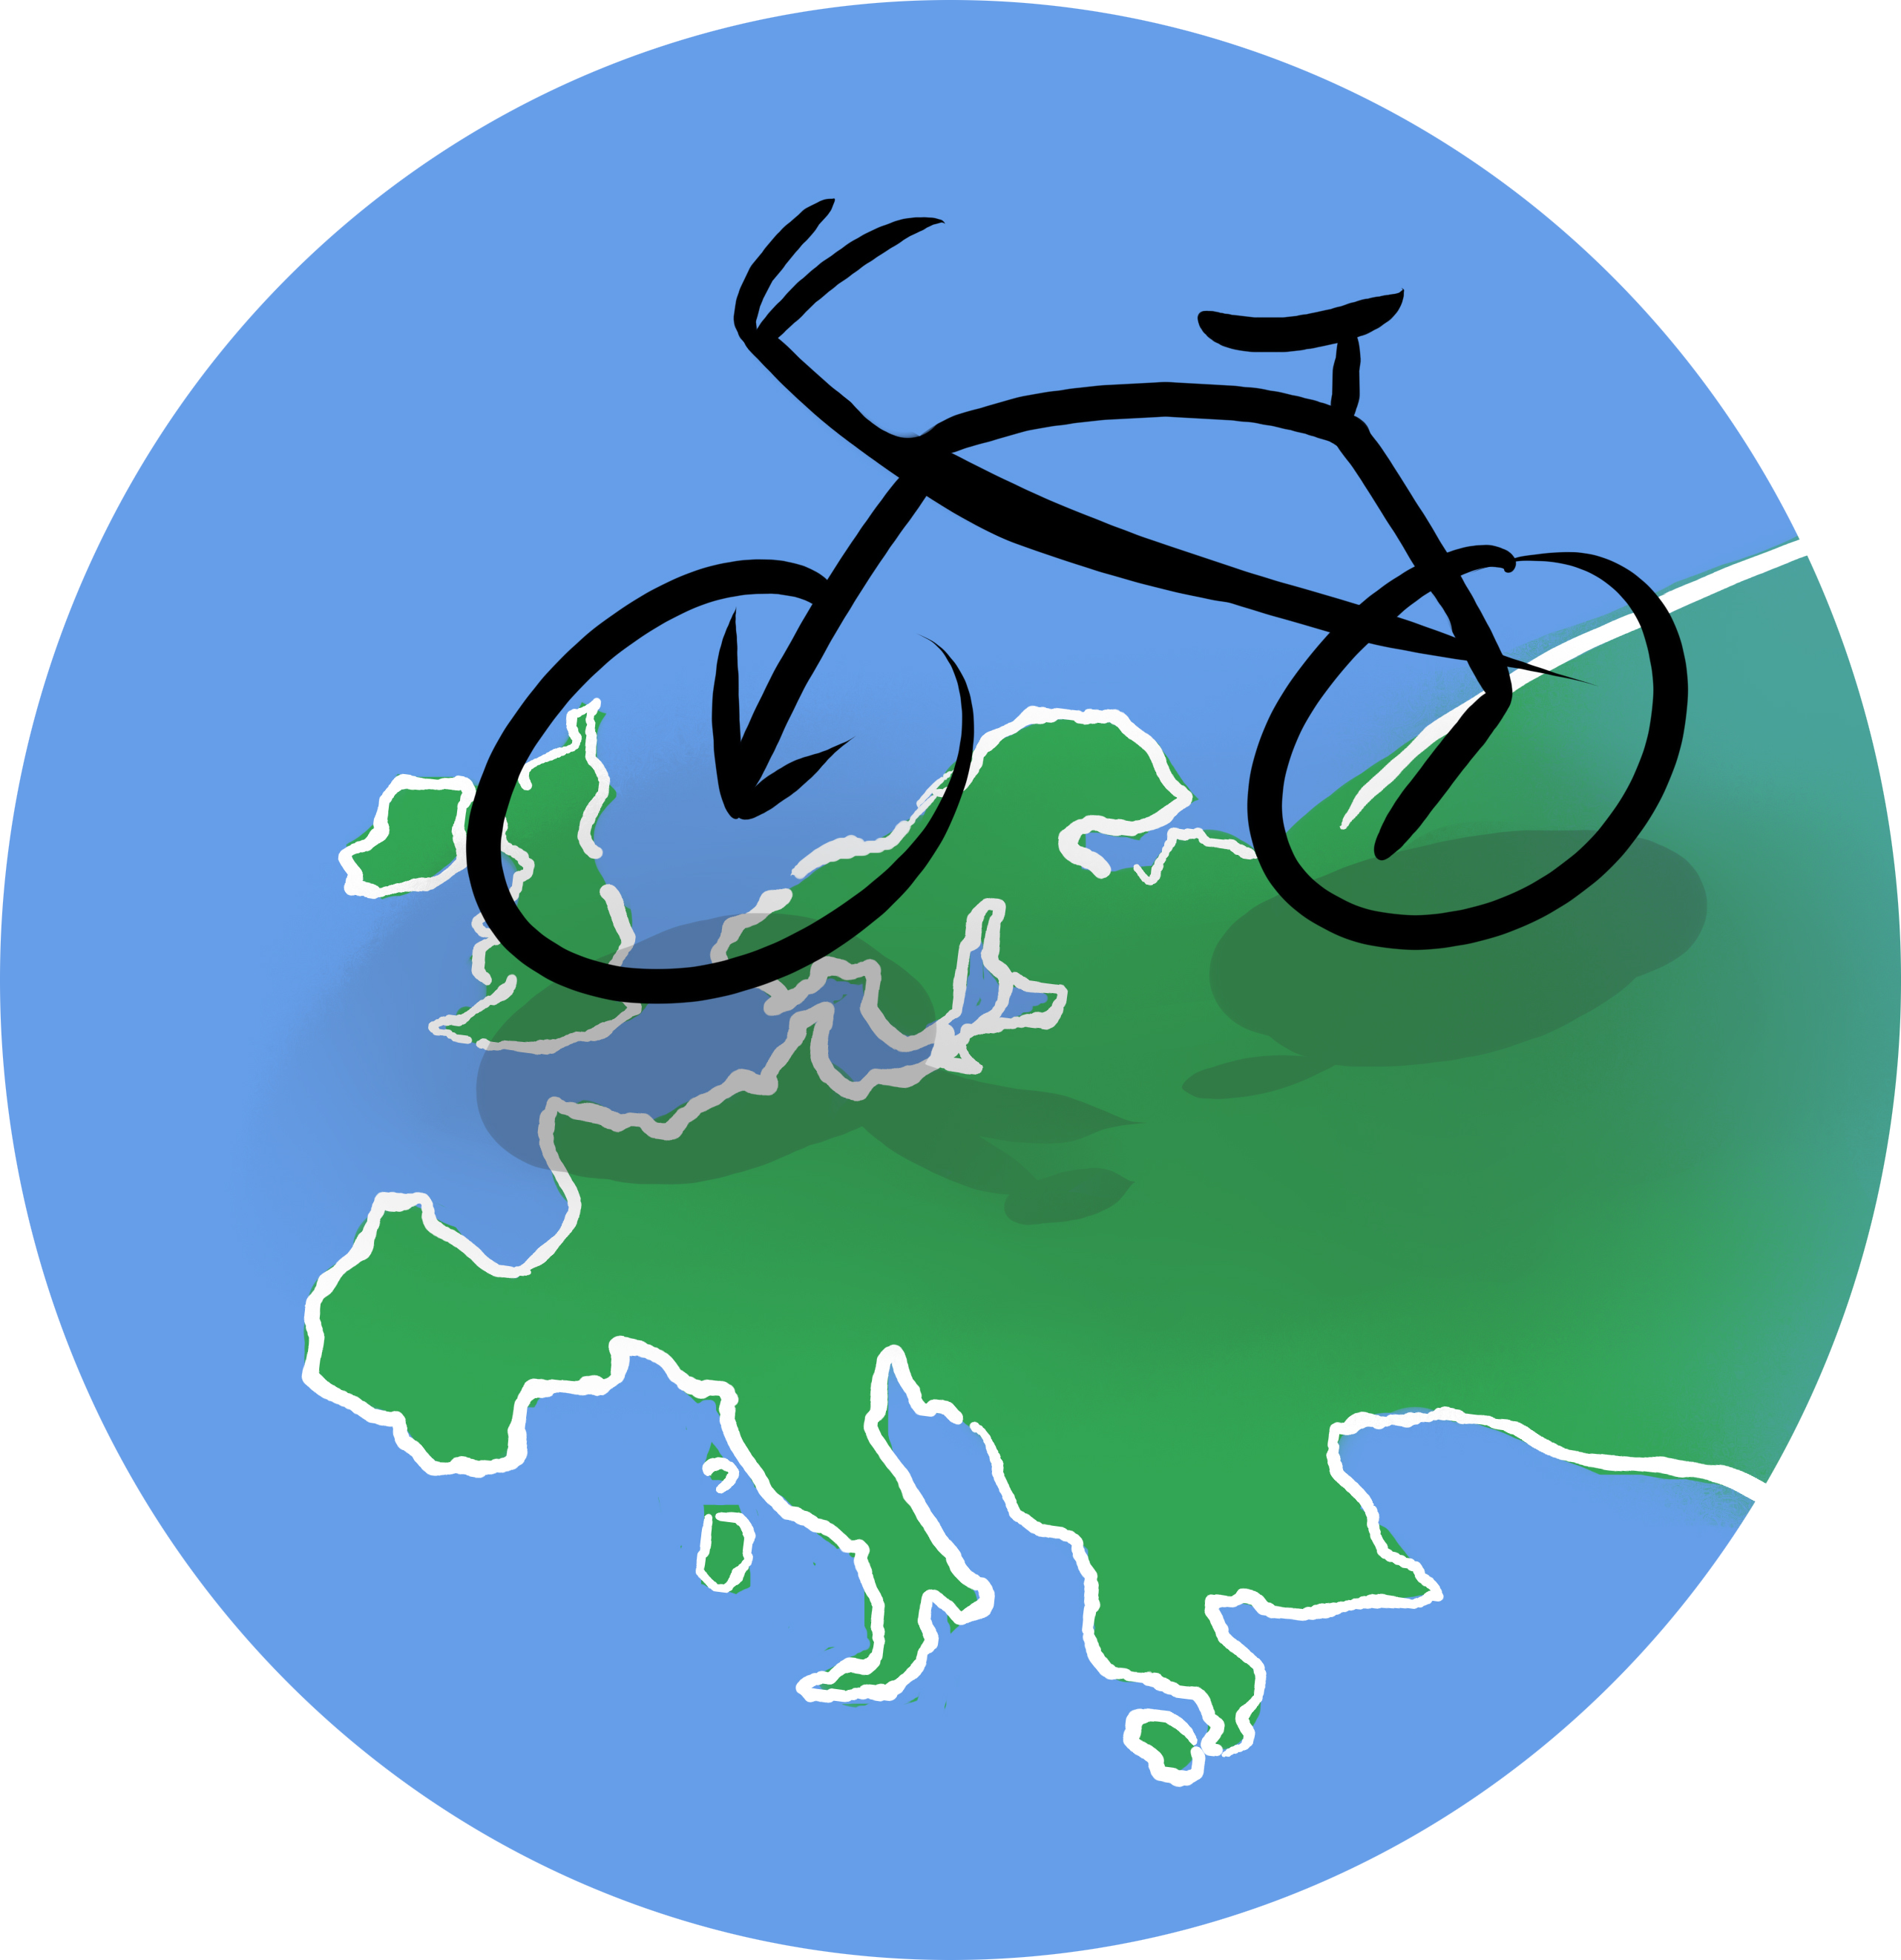 Europa2velos